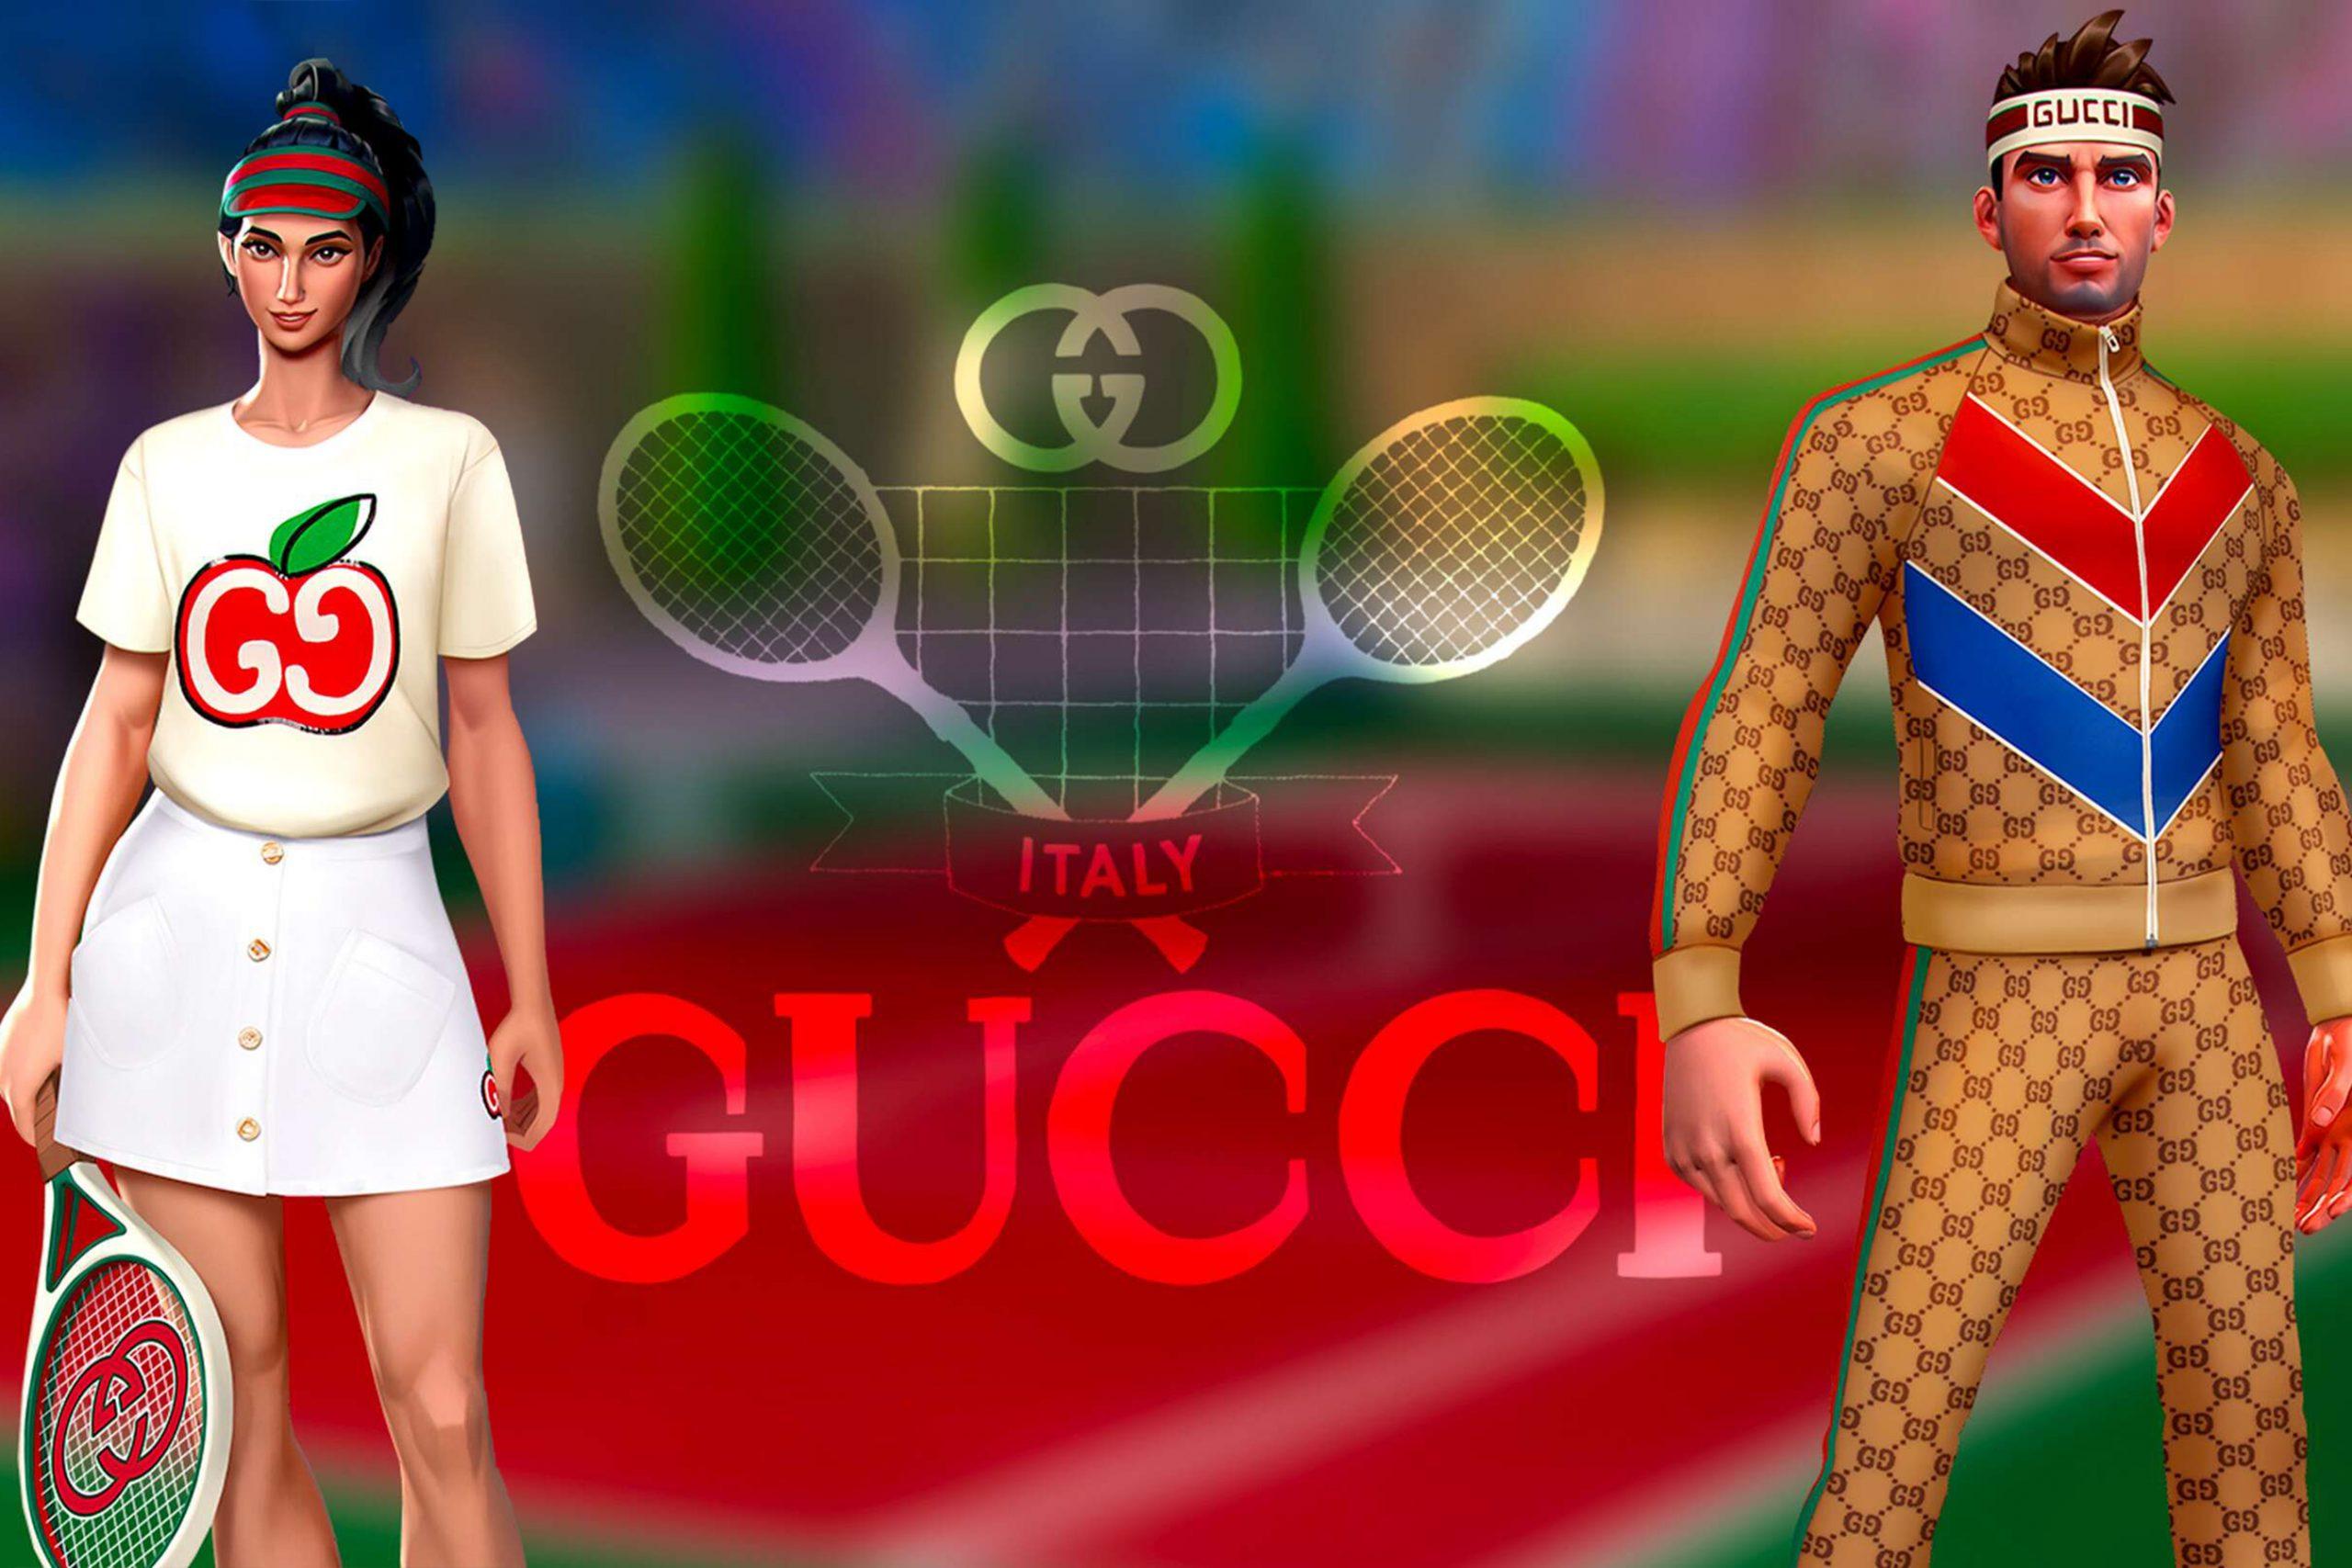 Gucci Tennis Clash Collaboration Pictures